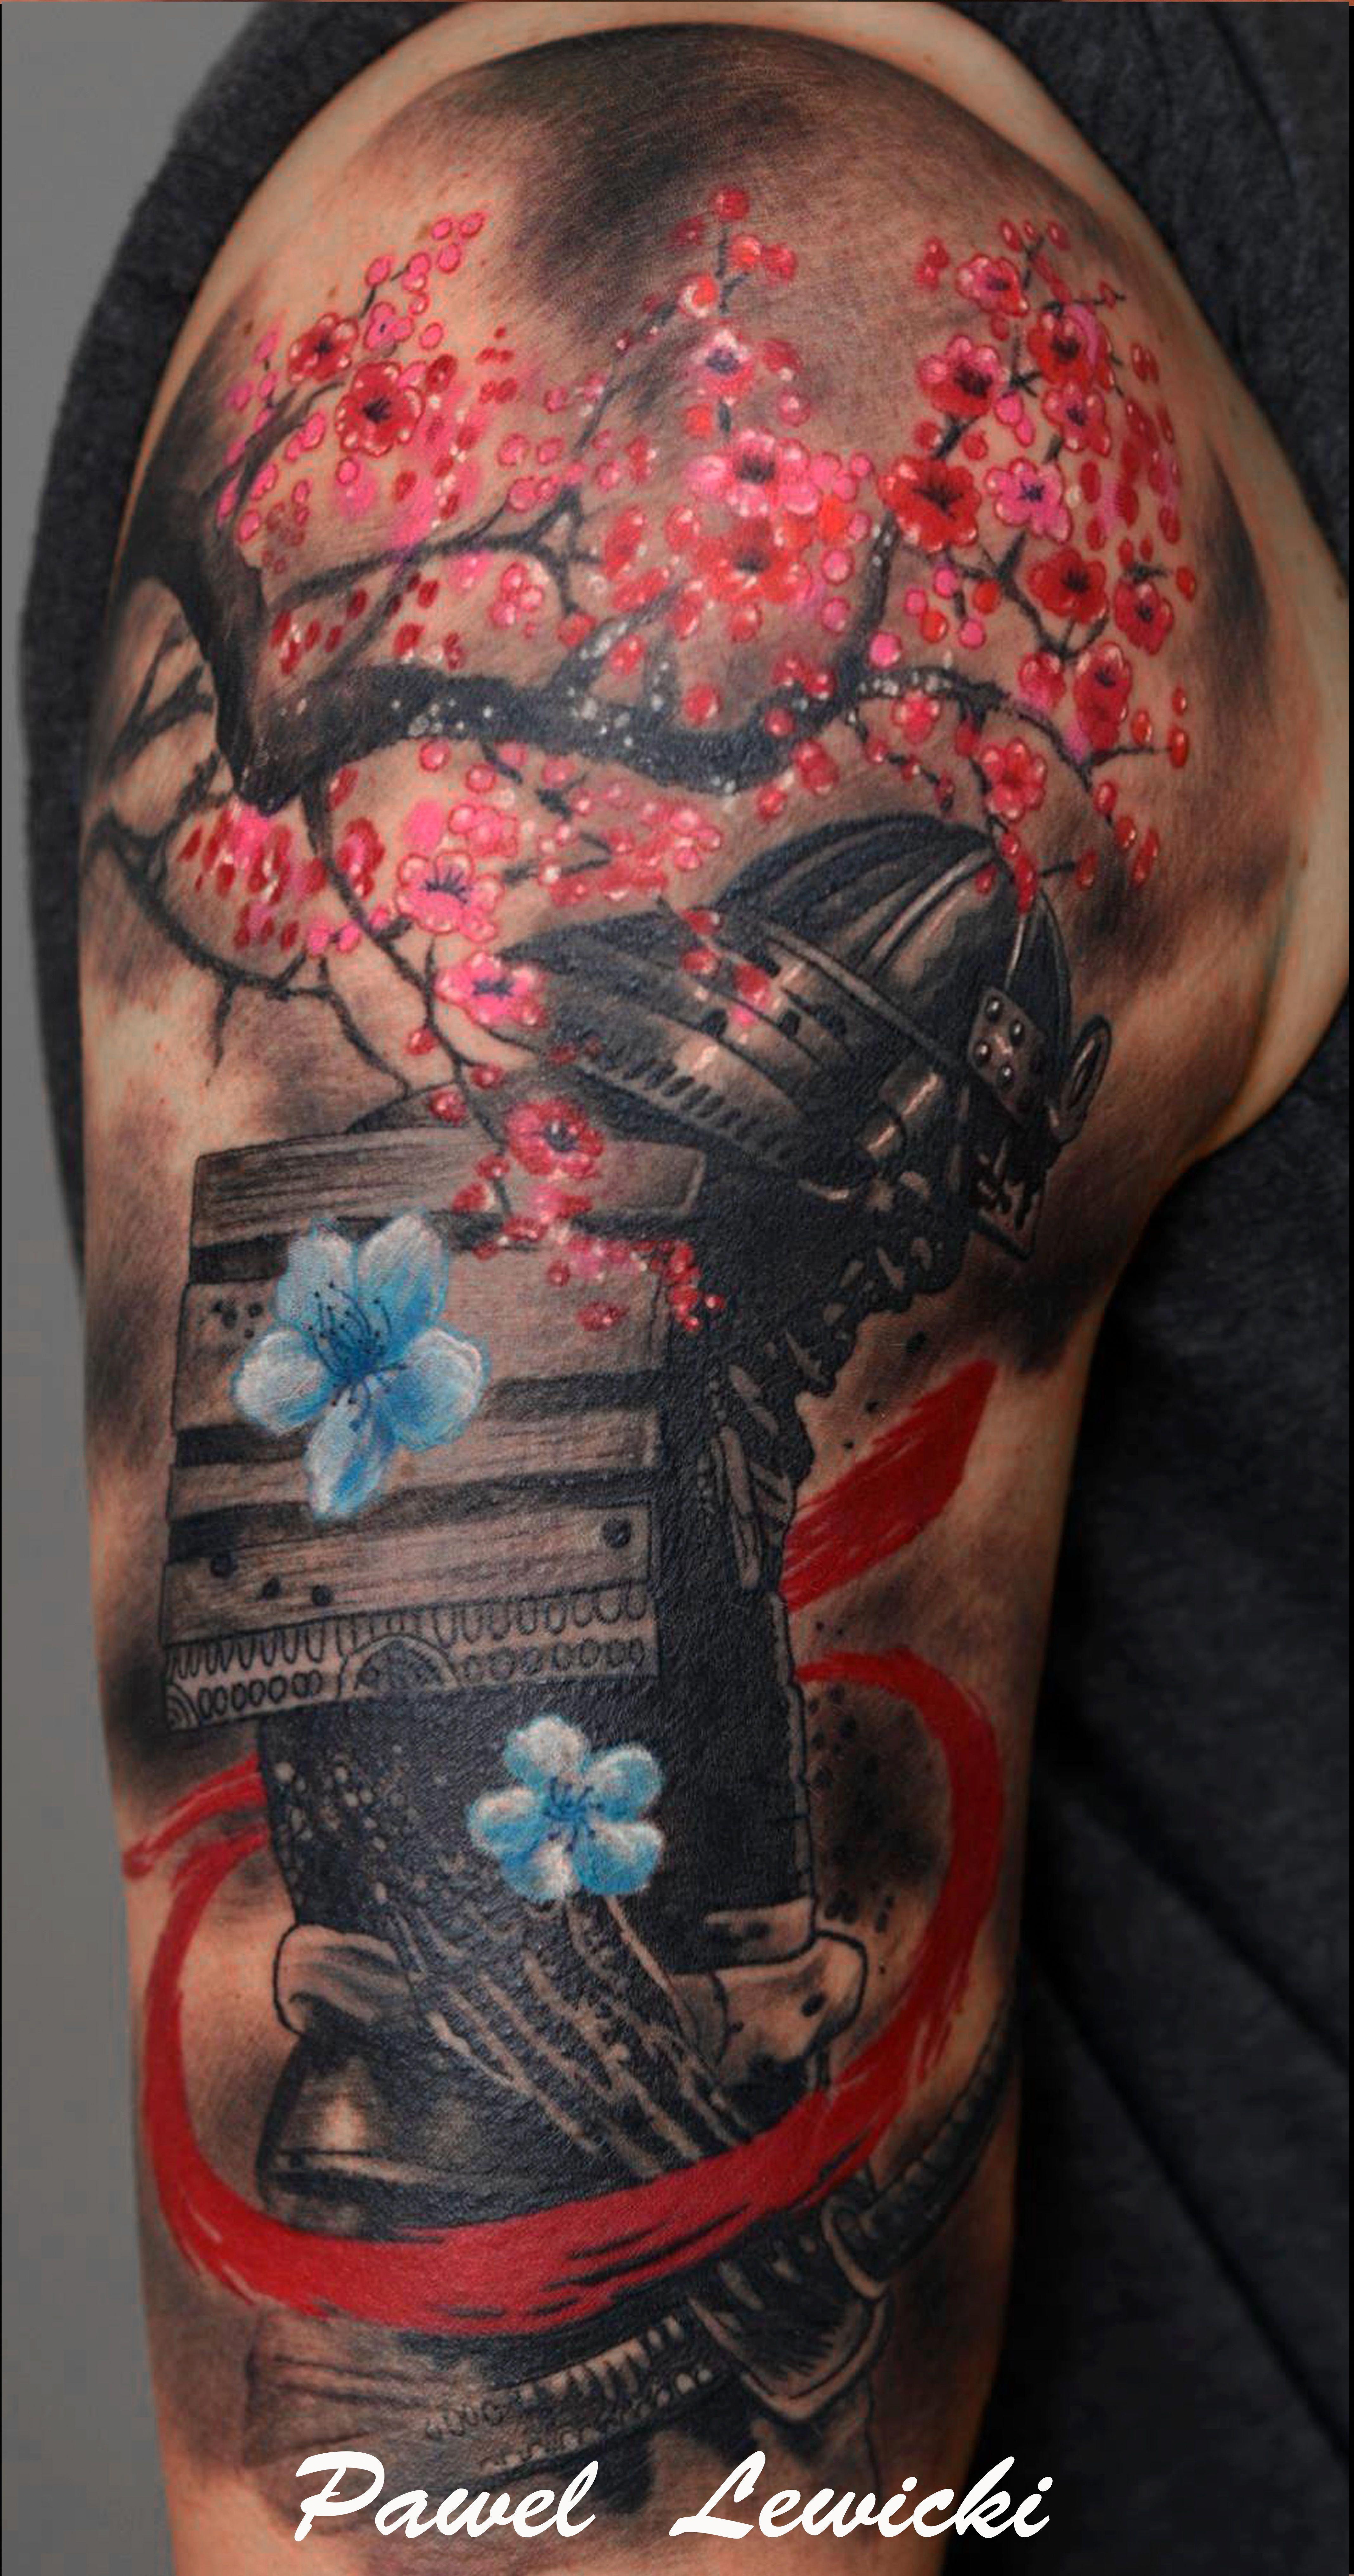 Samurai Japanese Sleeve Color Cherryblossom Flowers Top Ink Dublin Master Artist Tattoo Ireland Japaneset Sleeve Tattoos Tattoos Tattoos For Guys